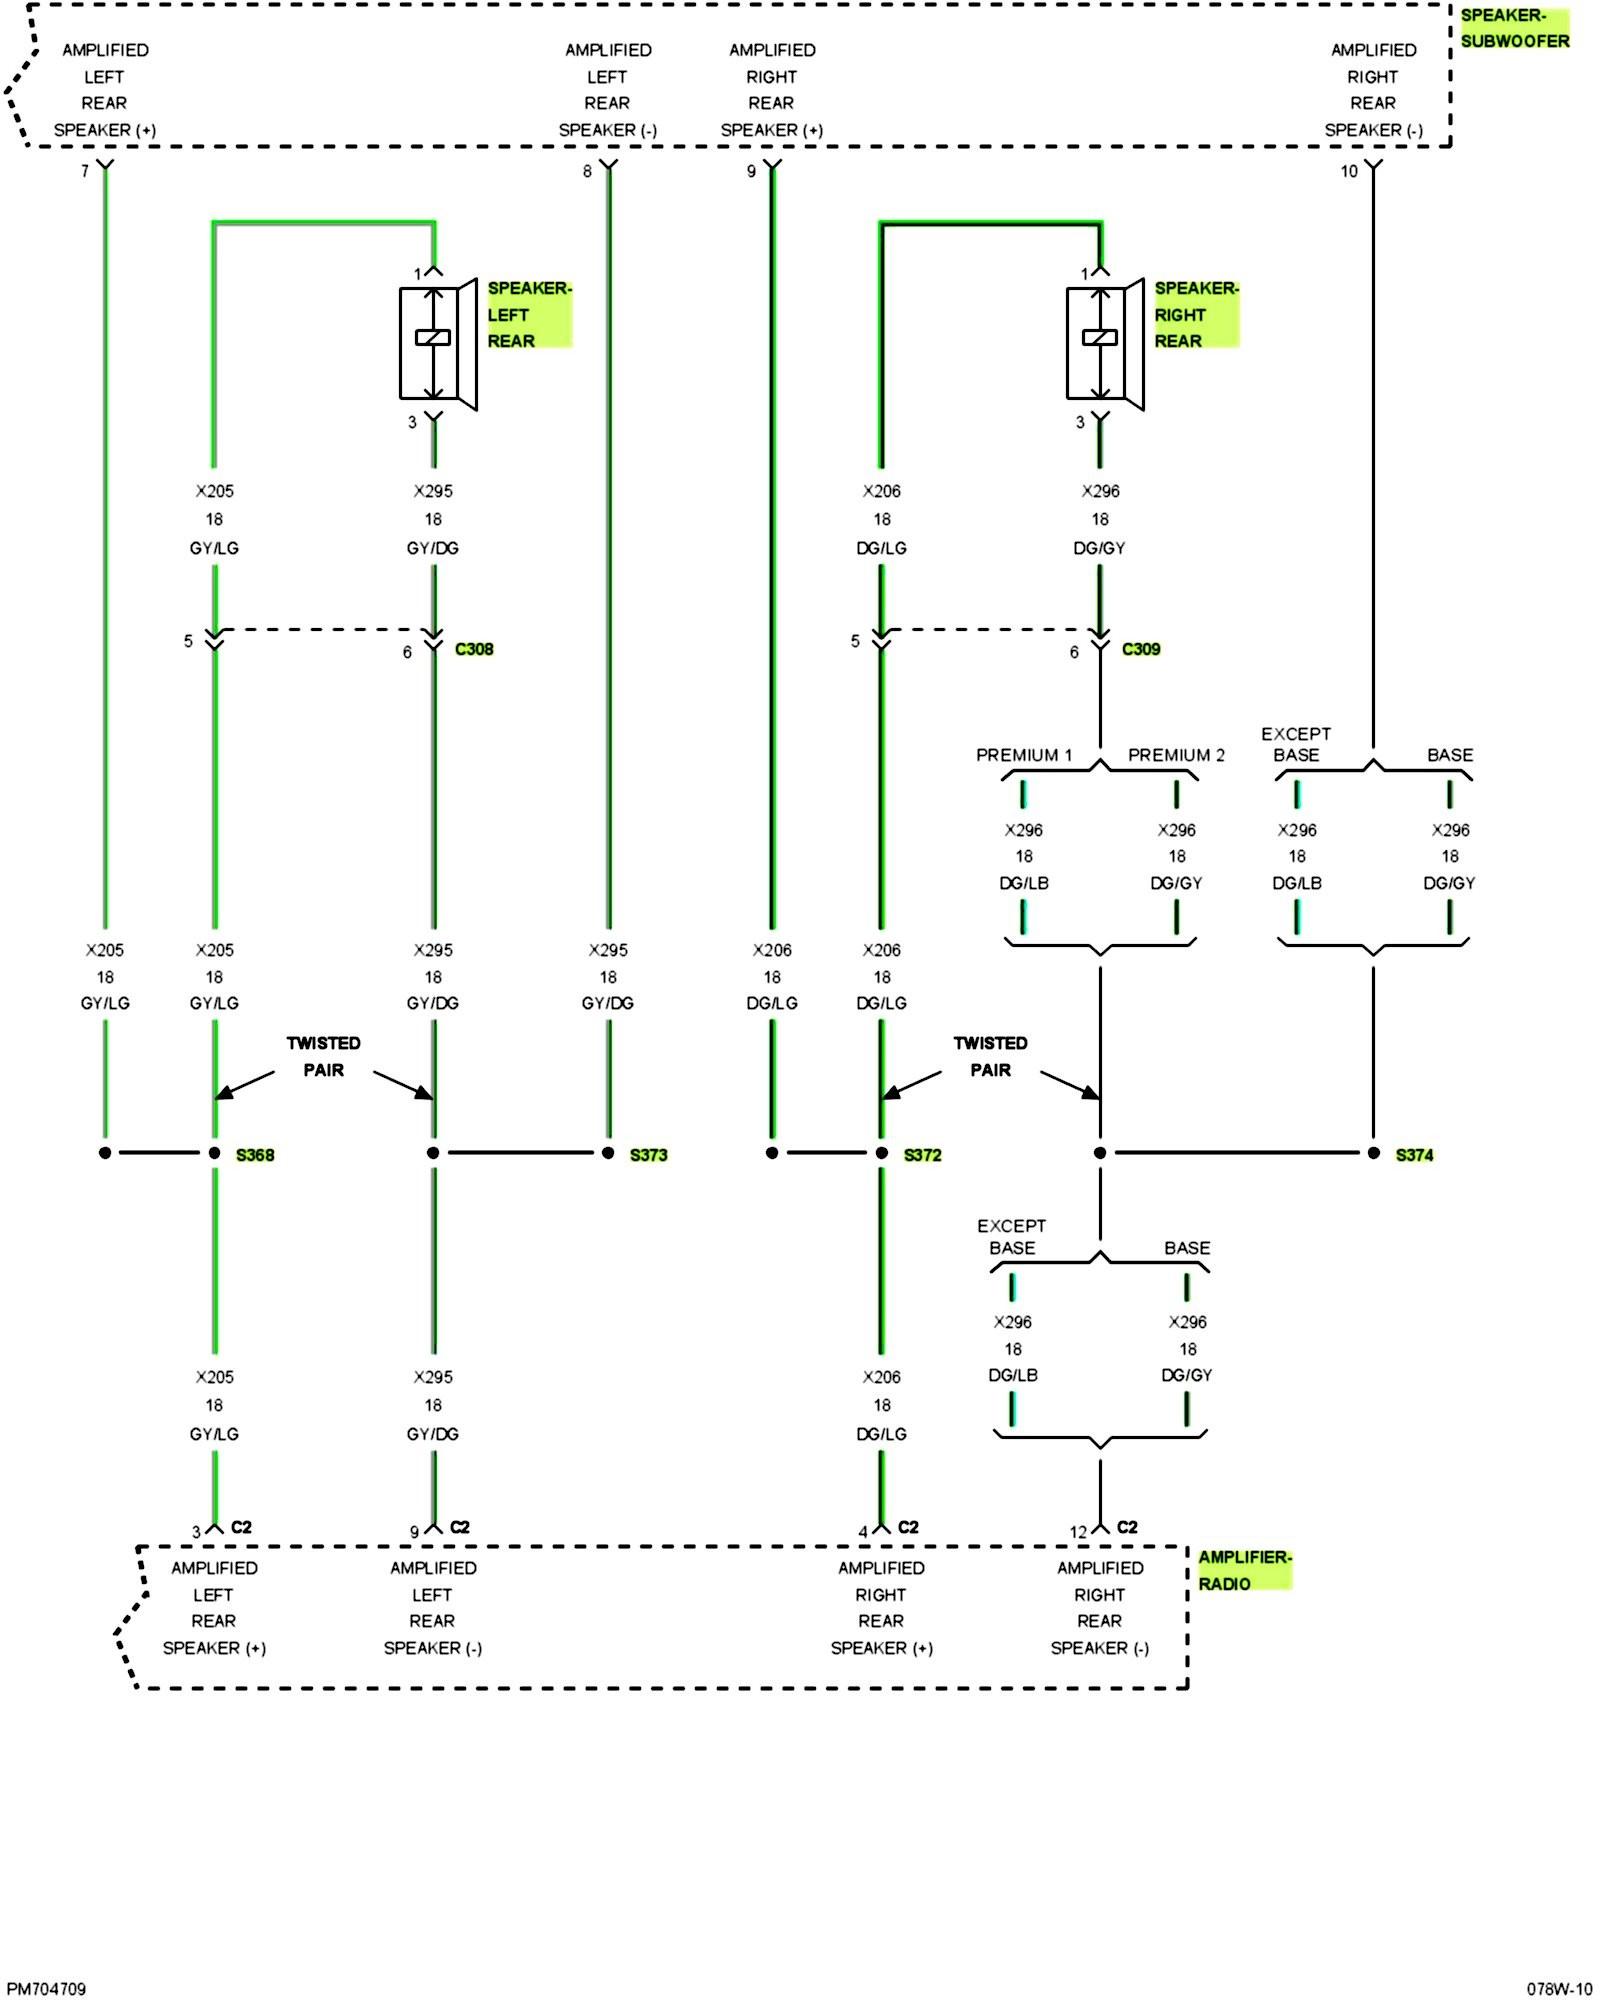 Dodge Caliber Engine Diagram Car Wiring Diagram for A 2008 Dodge Caliber Wiring Diagram for Of Dodge Caliber Engine Diagram